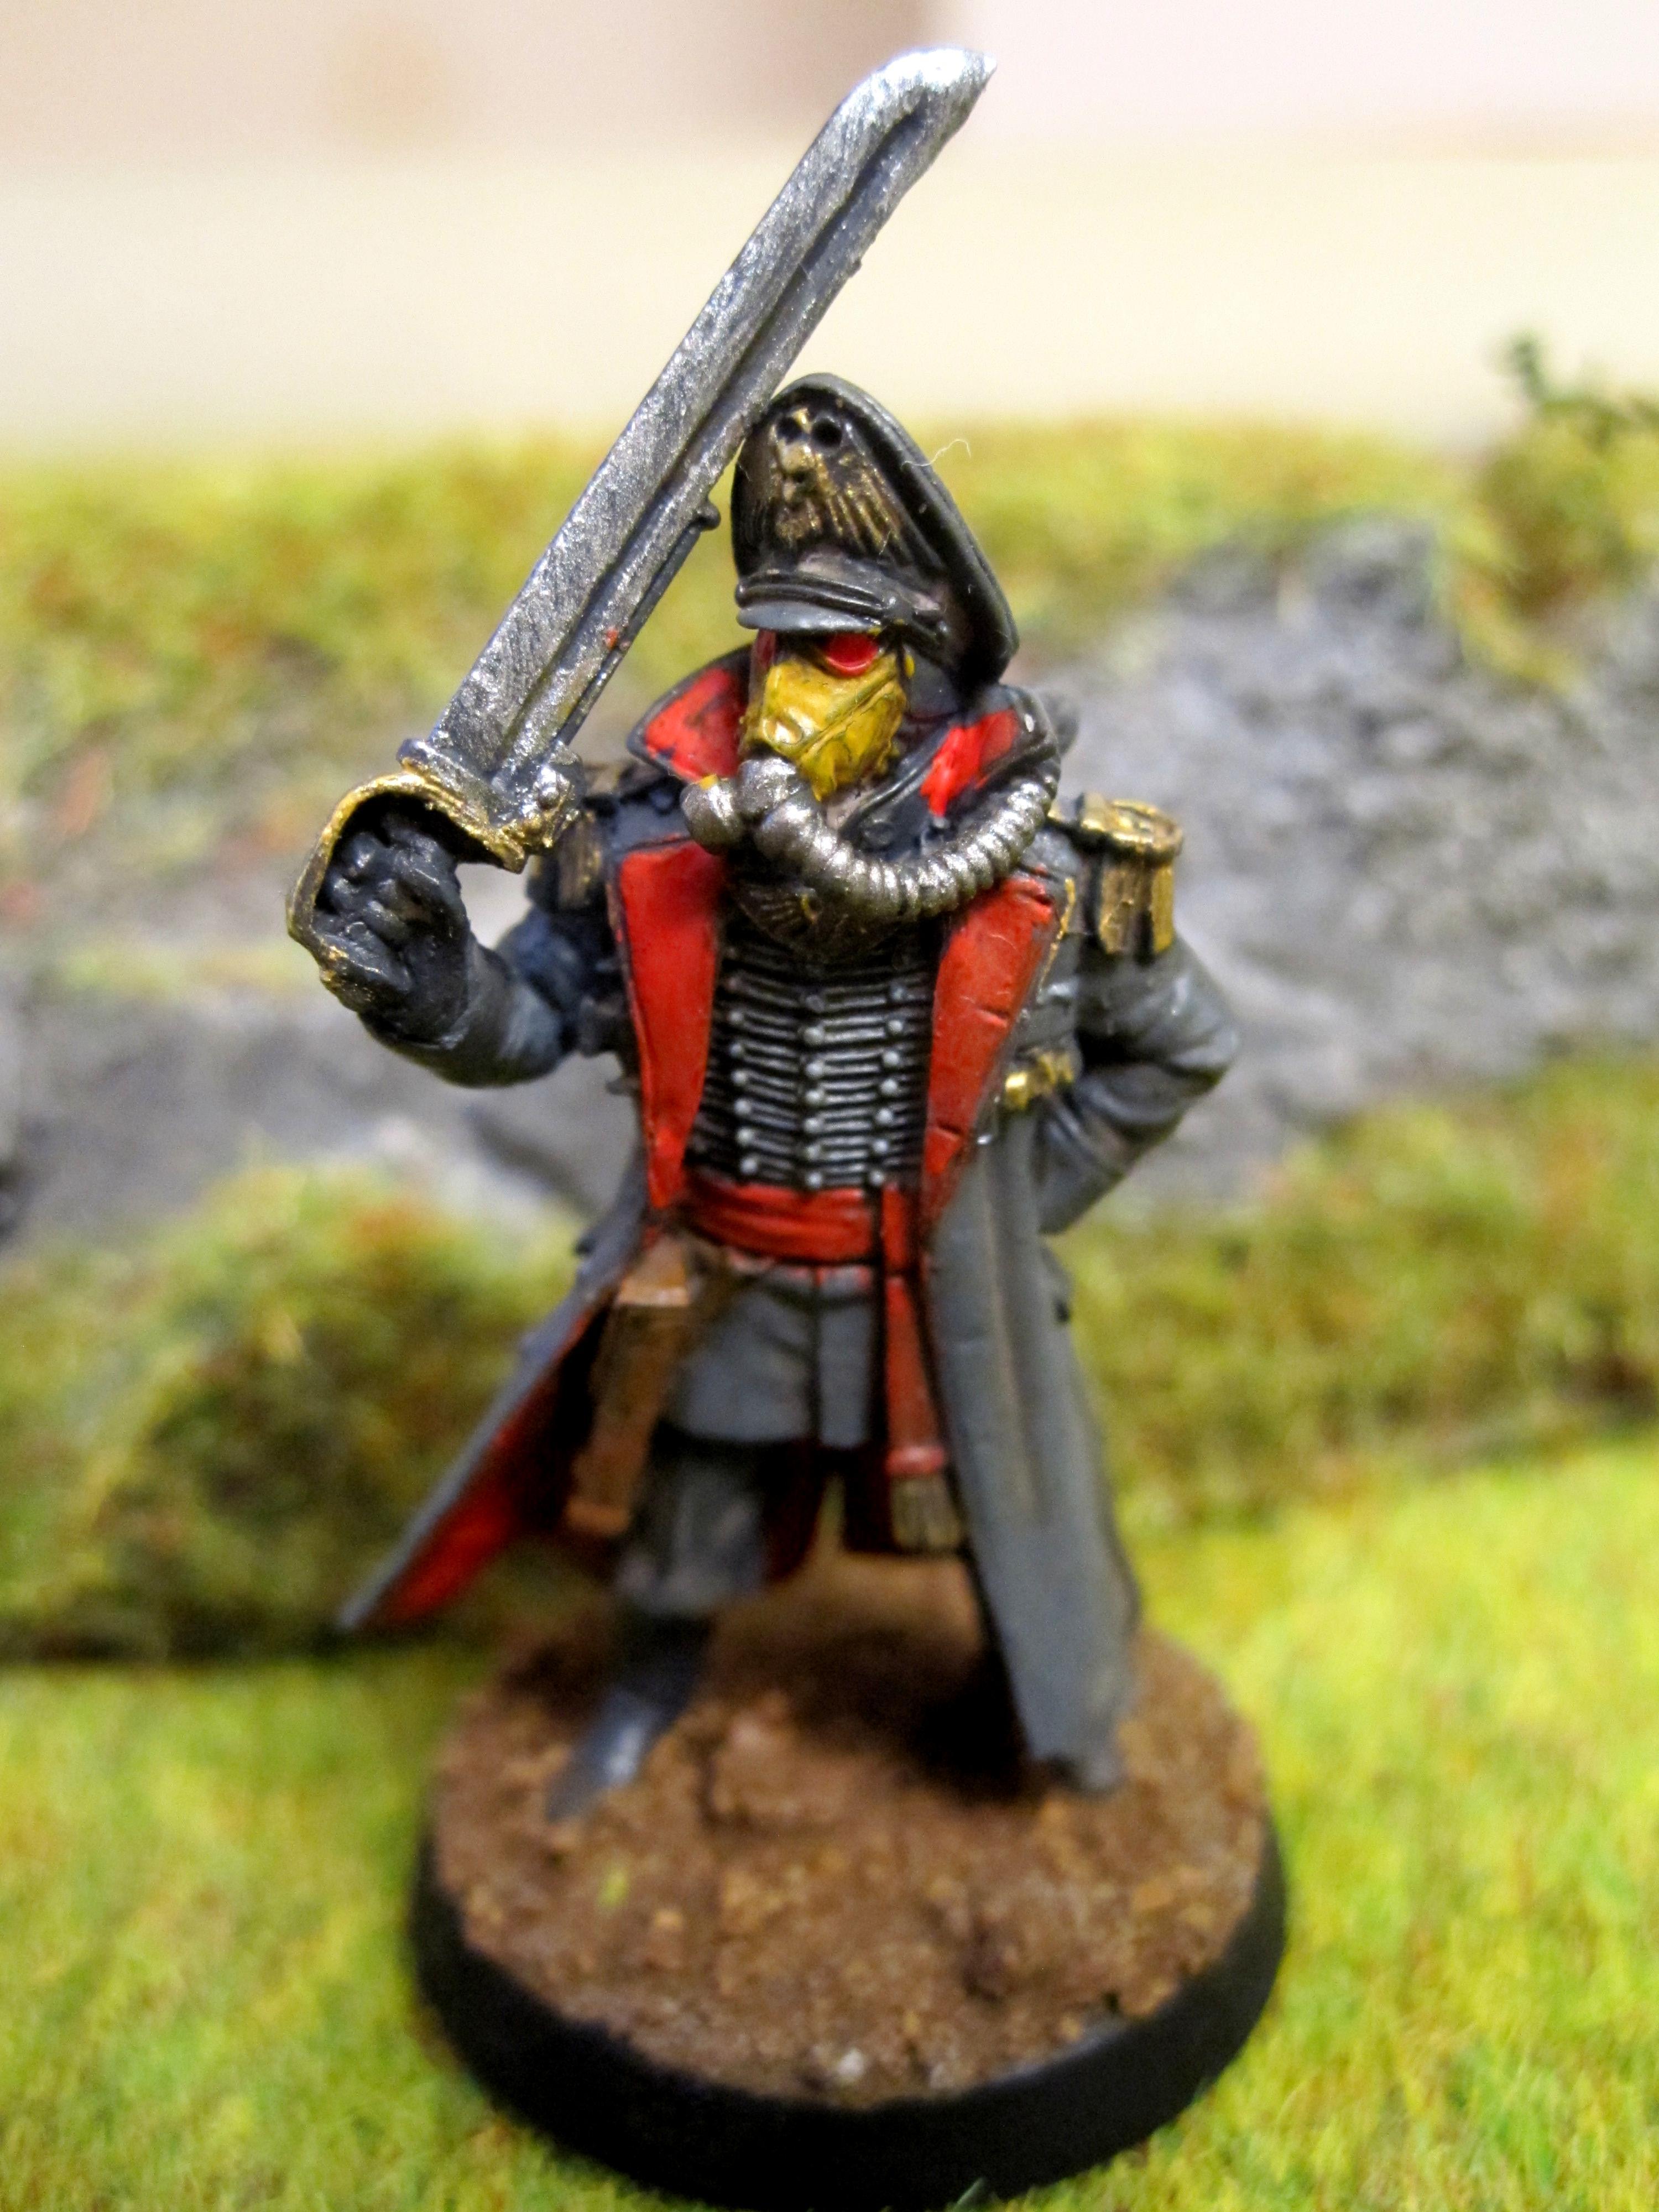 Commissar, Death, Death Korps of Krieg, Forge, Korps, Power Sword, World